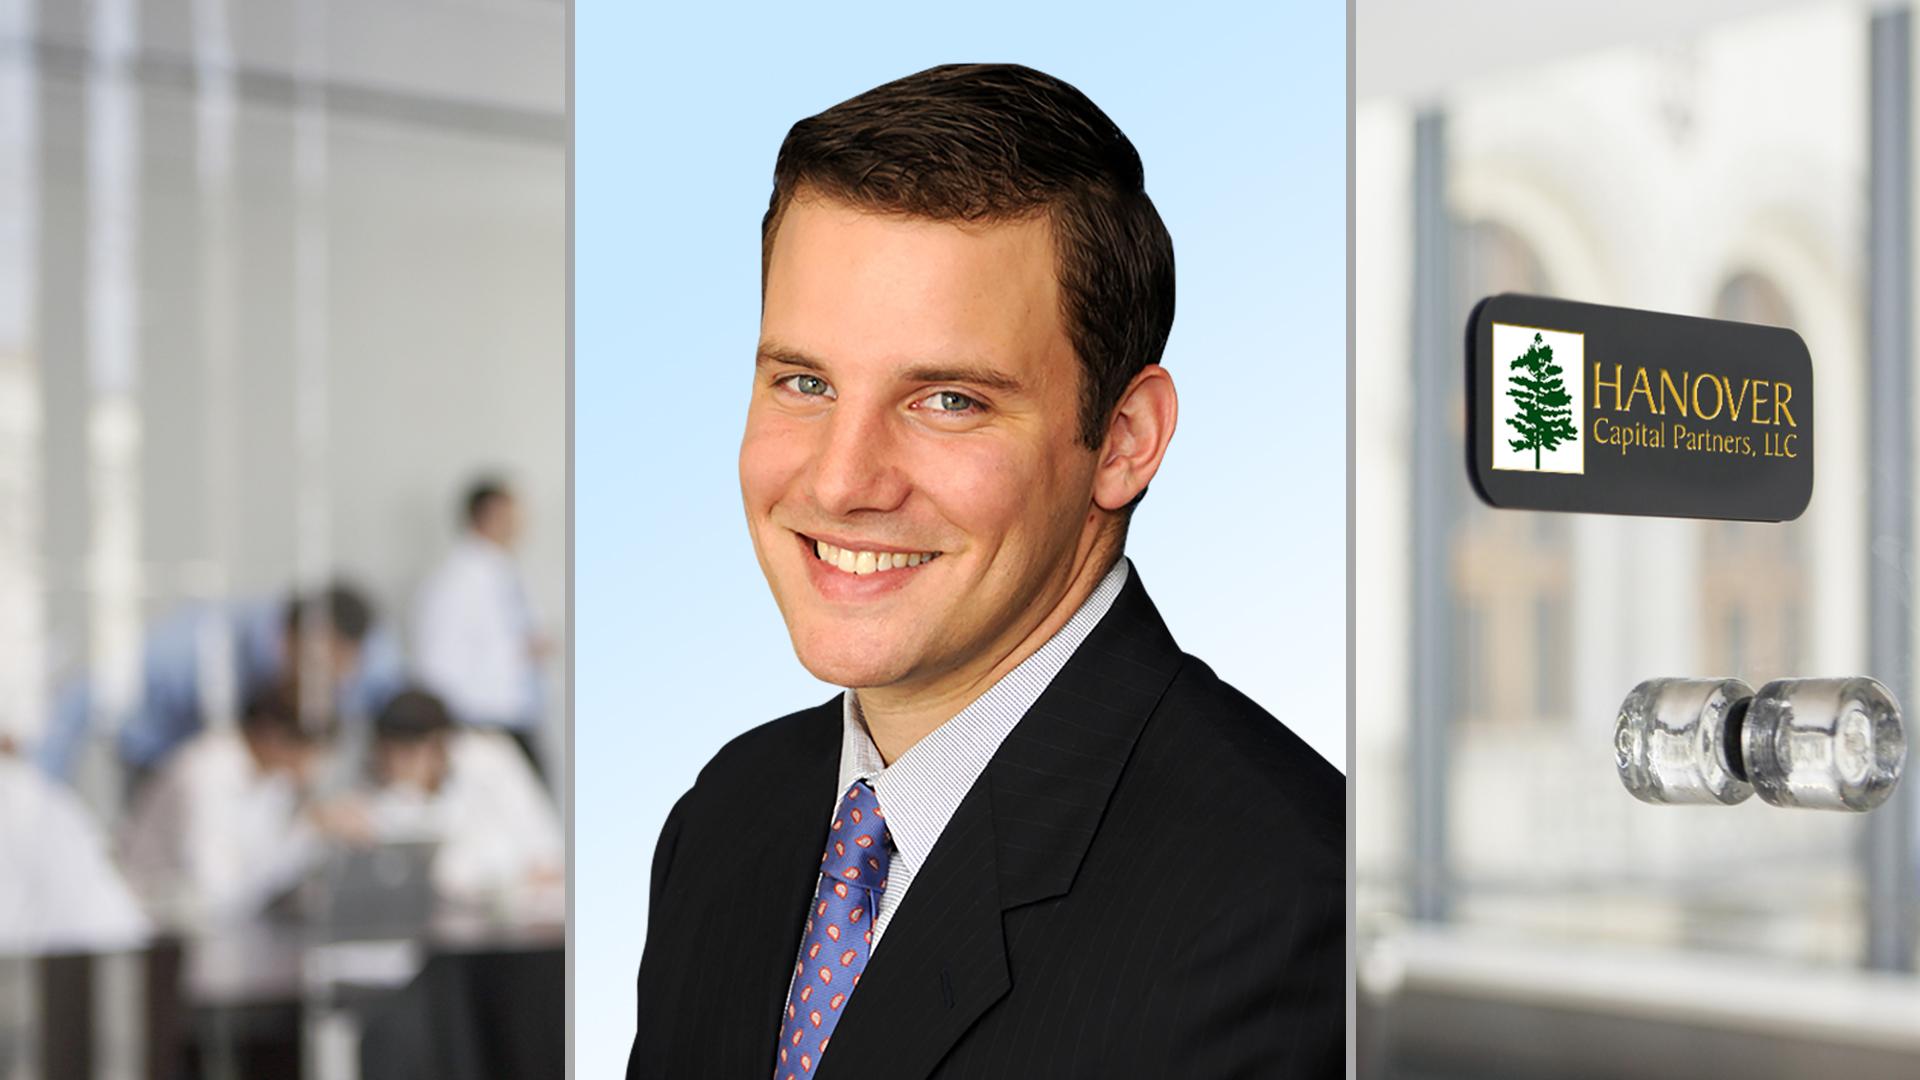 J. Matthew Orosz - Vice President of Investments